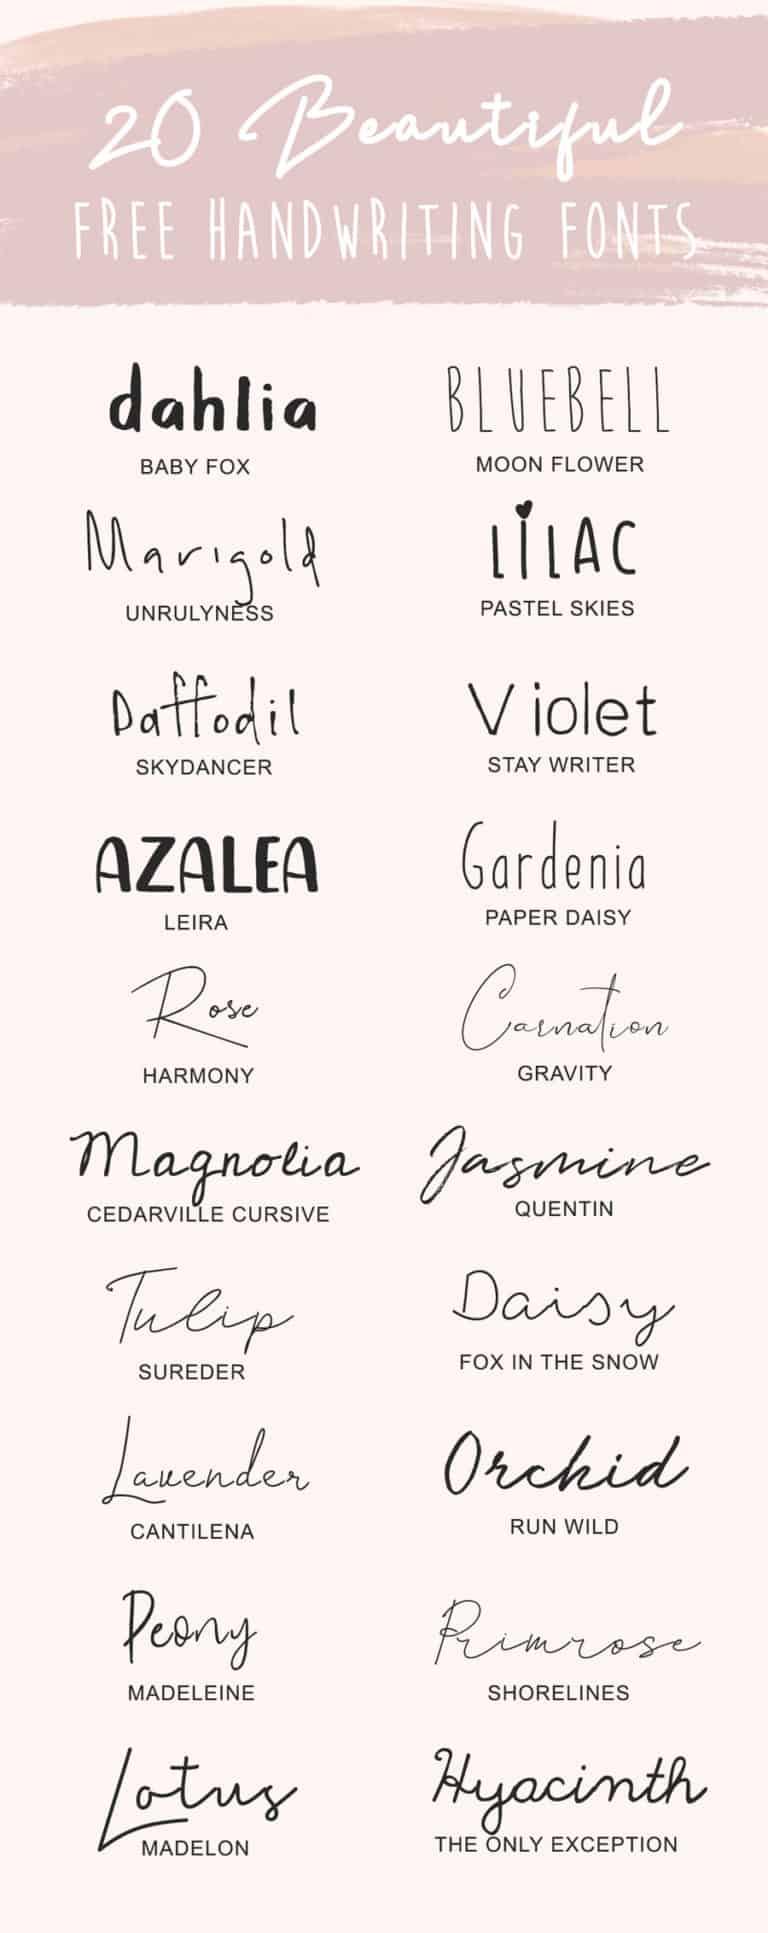 Favorite Free Handwriting Fonts